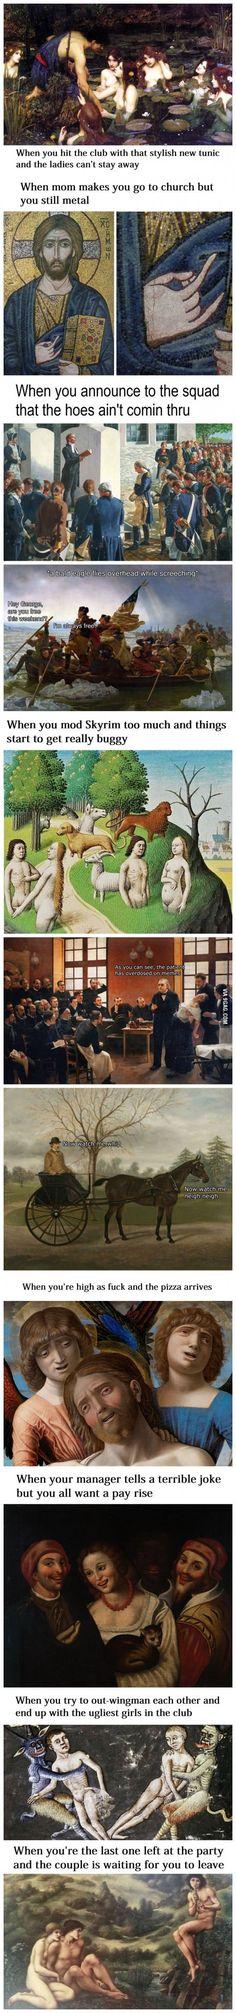 Classical Art Memes Latest (Part-1)